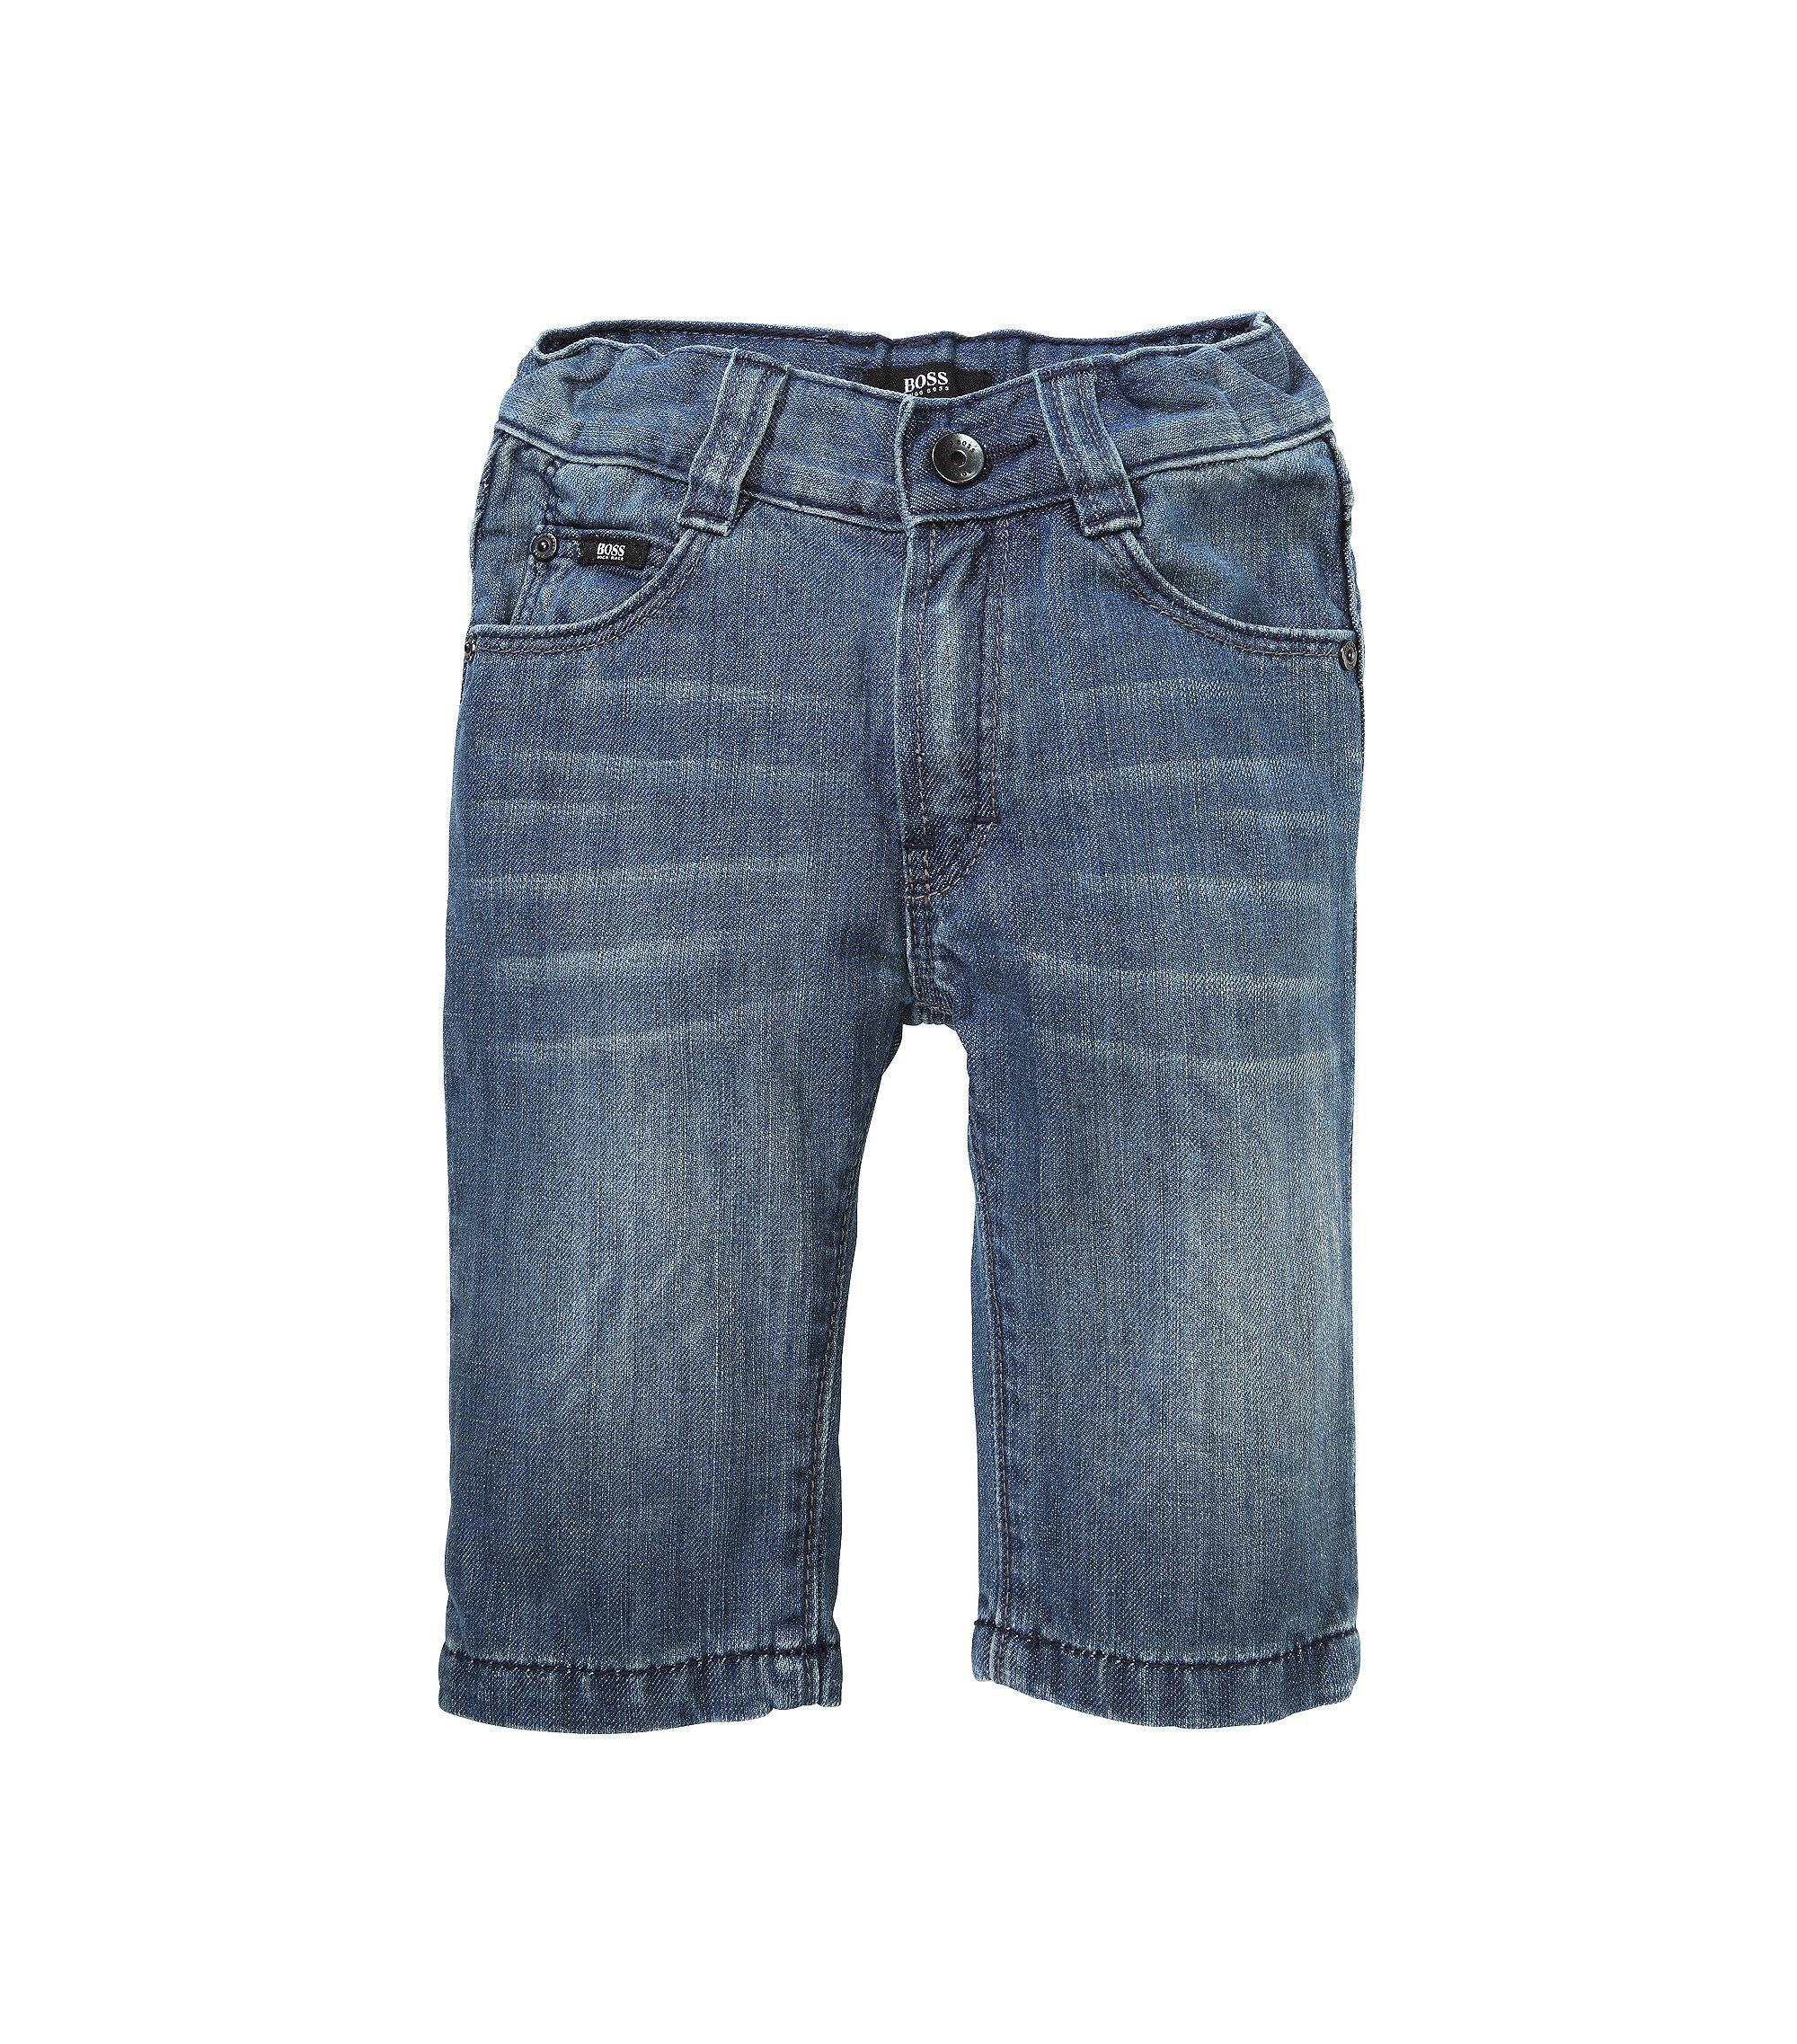 Kids-Jeans ´J04159` aus Baumwolle, Gemustert